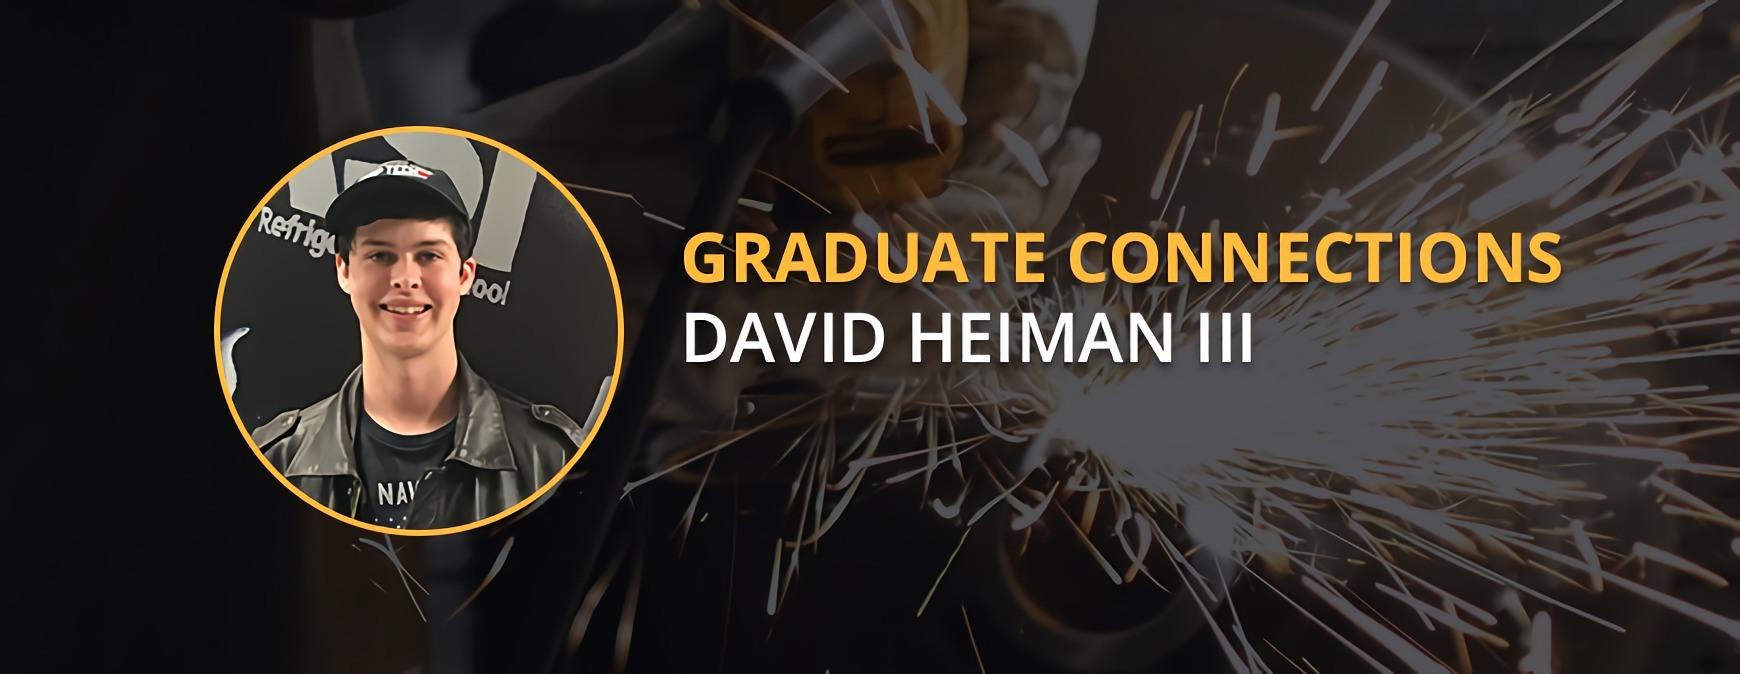 David Heiman III cover photo